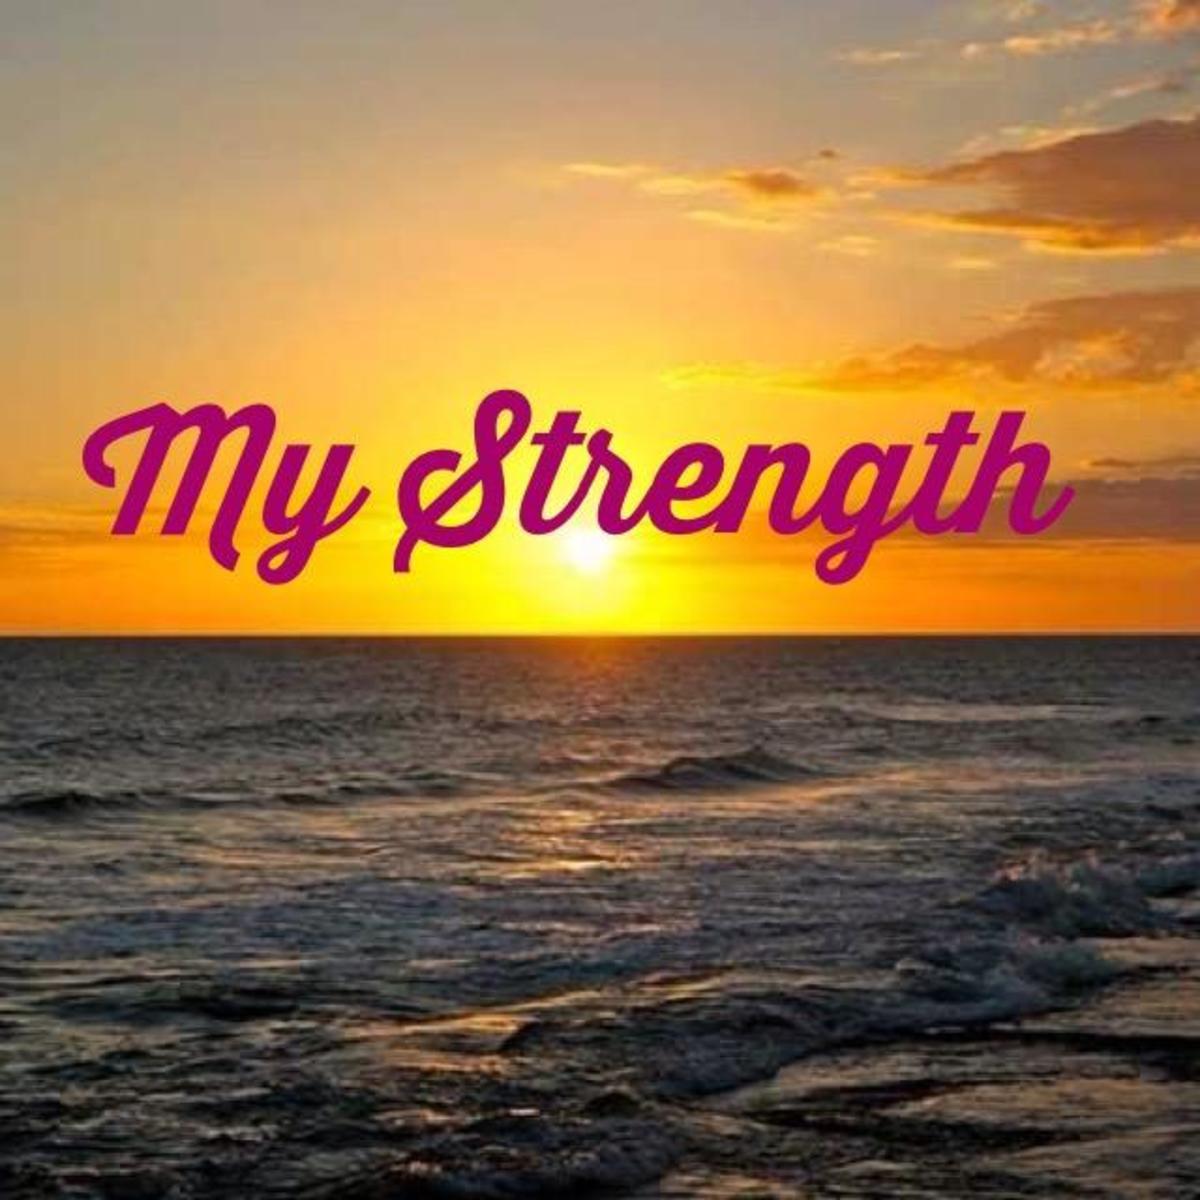 psalm-182-lists-8-metaphors-for-god